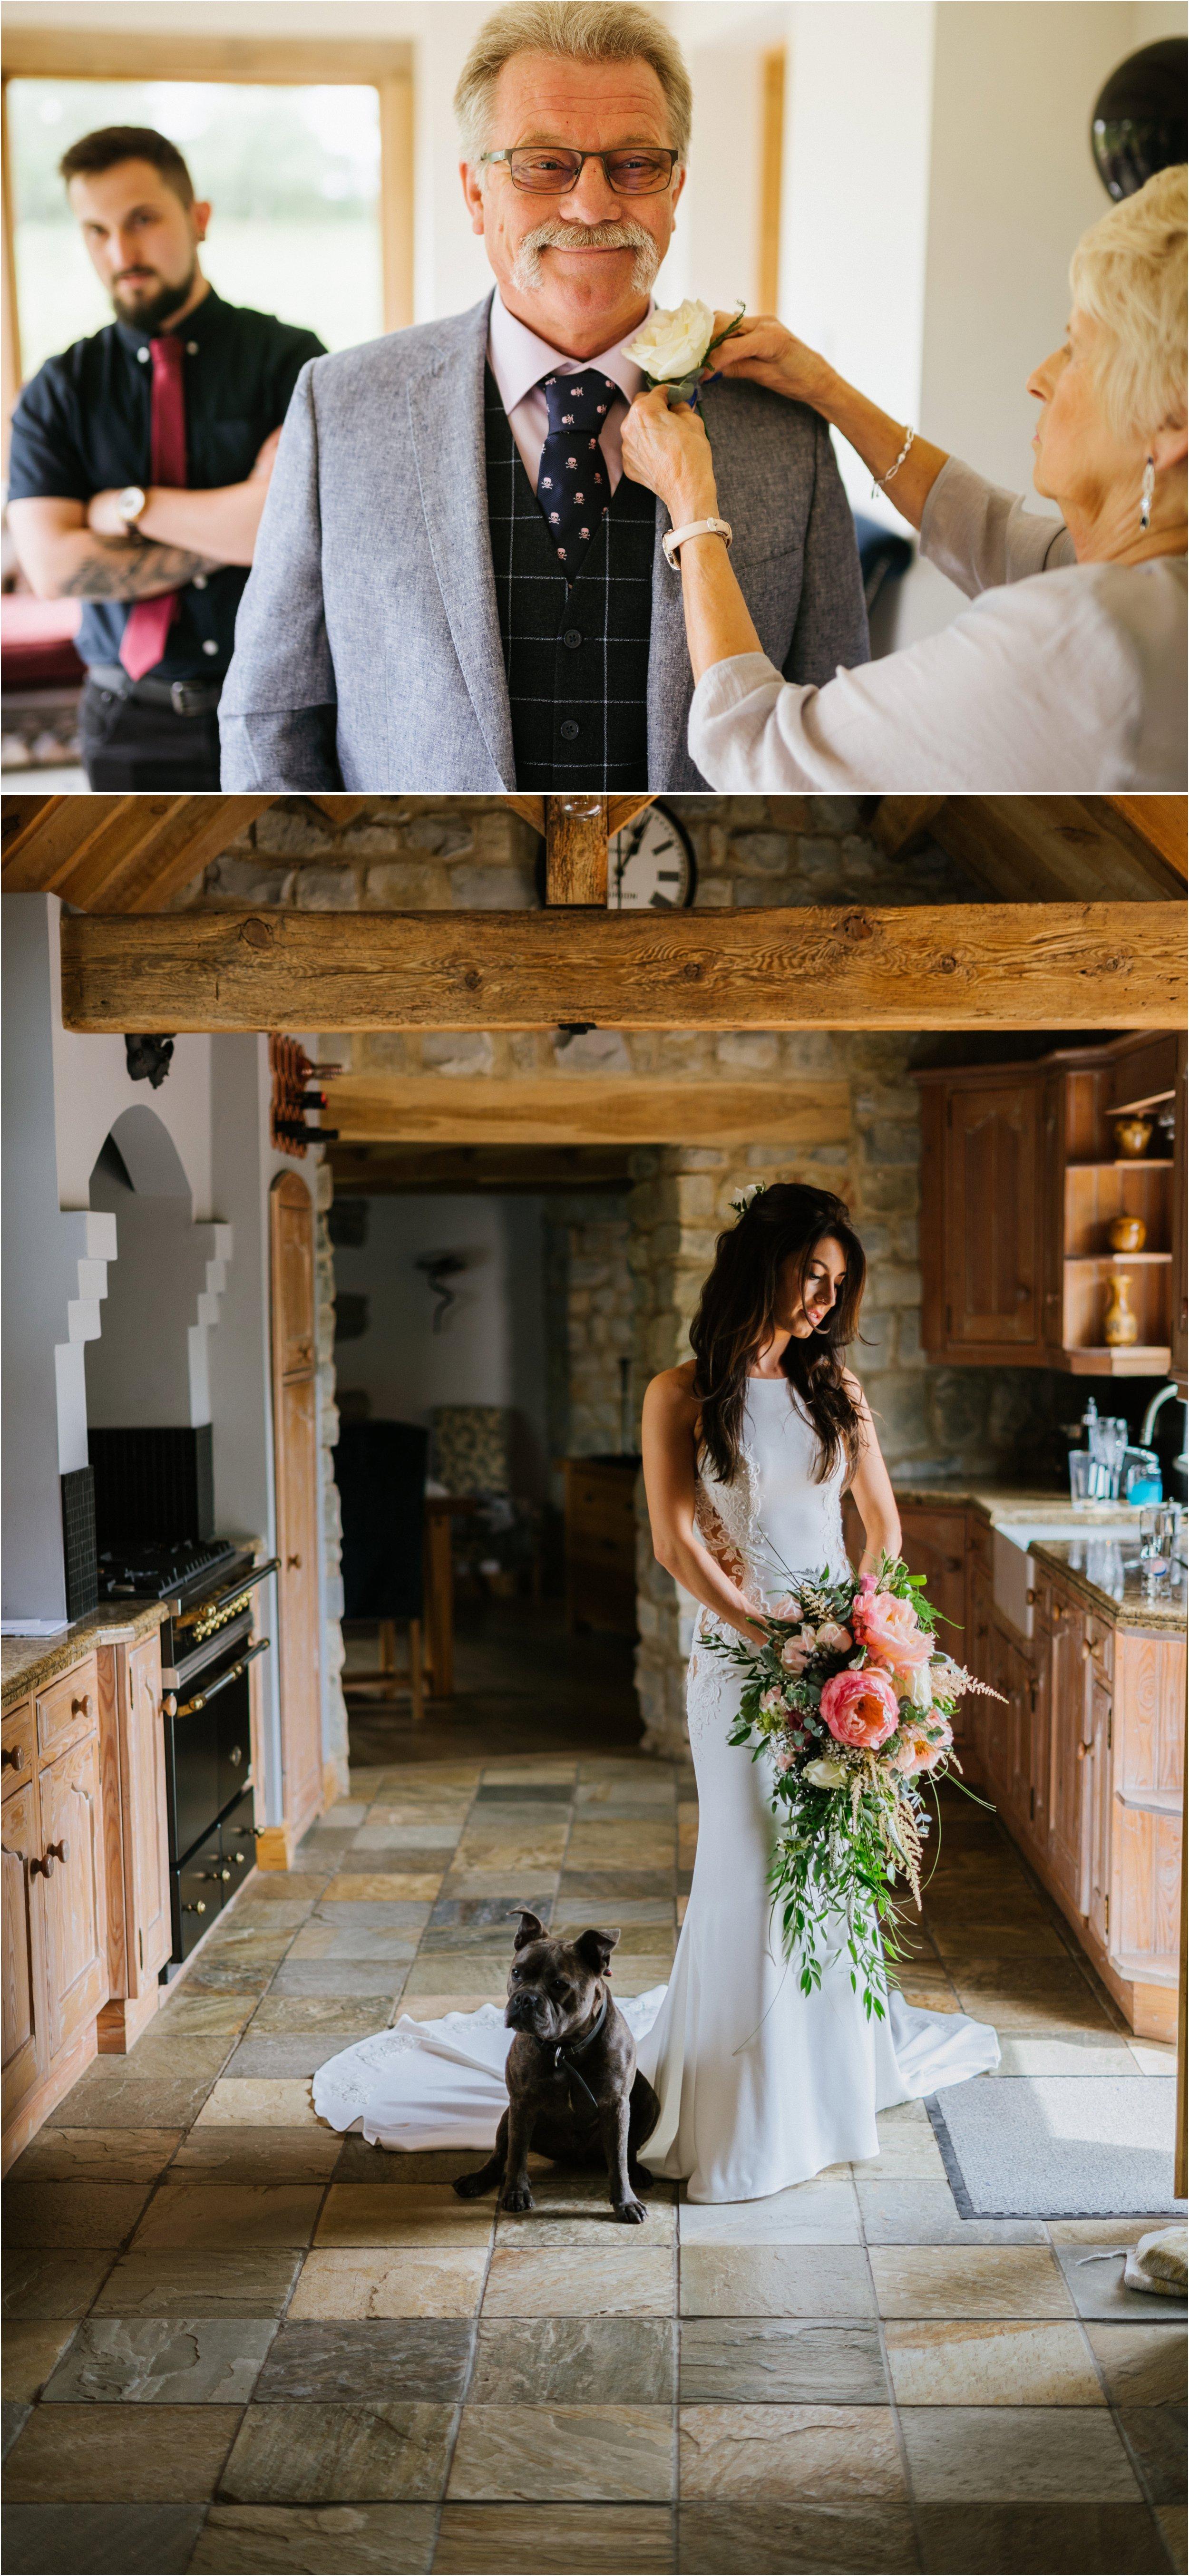 Compton Verney wedding photography_0024.jpg